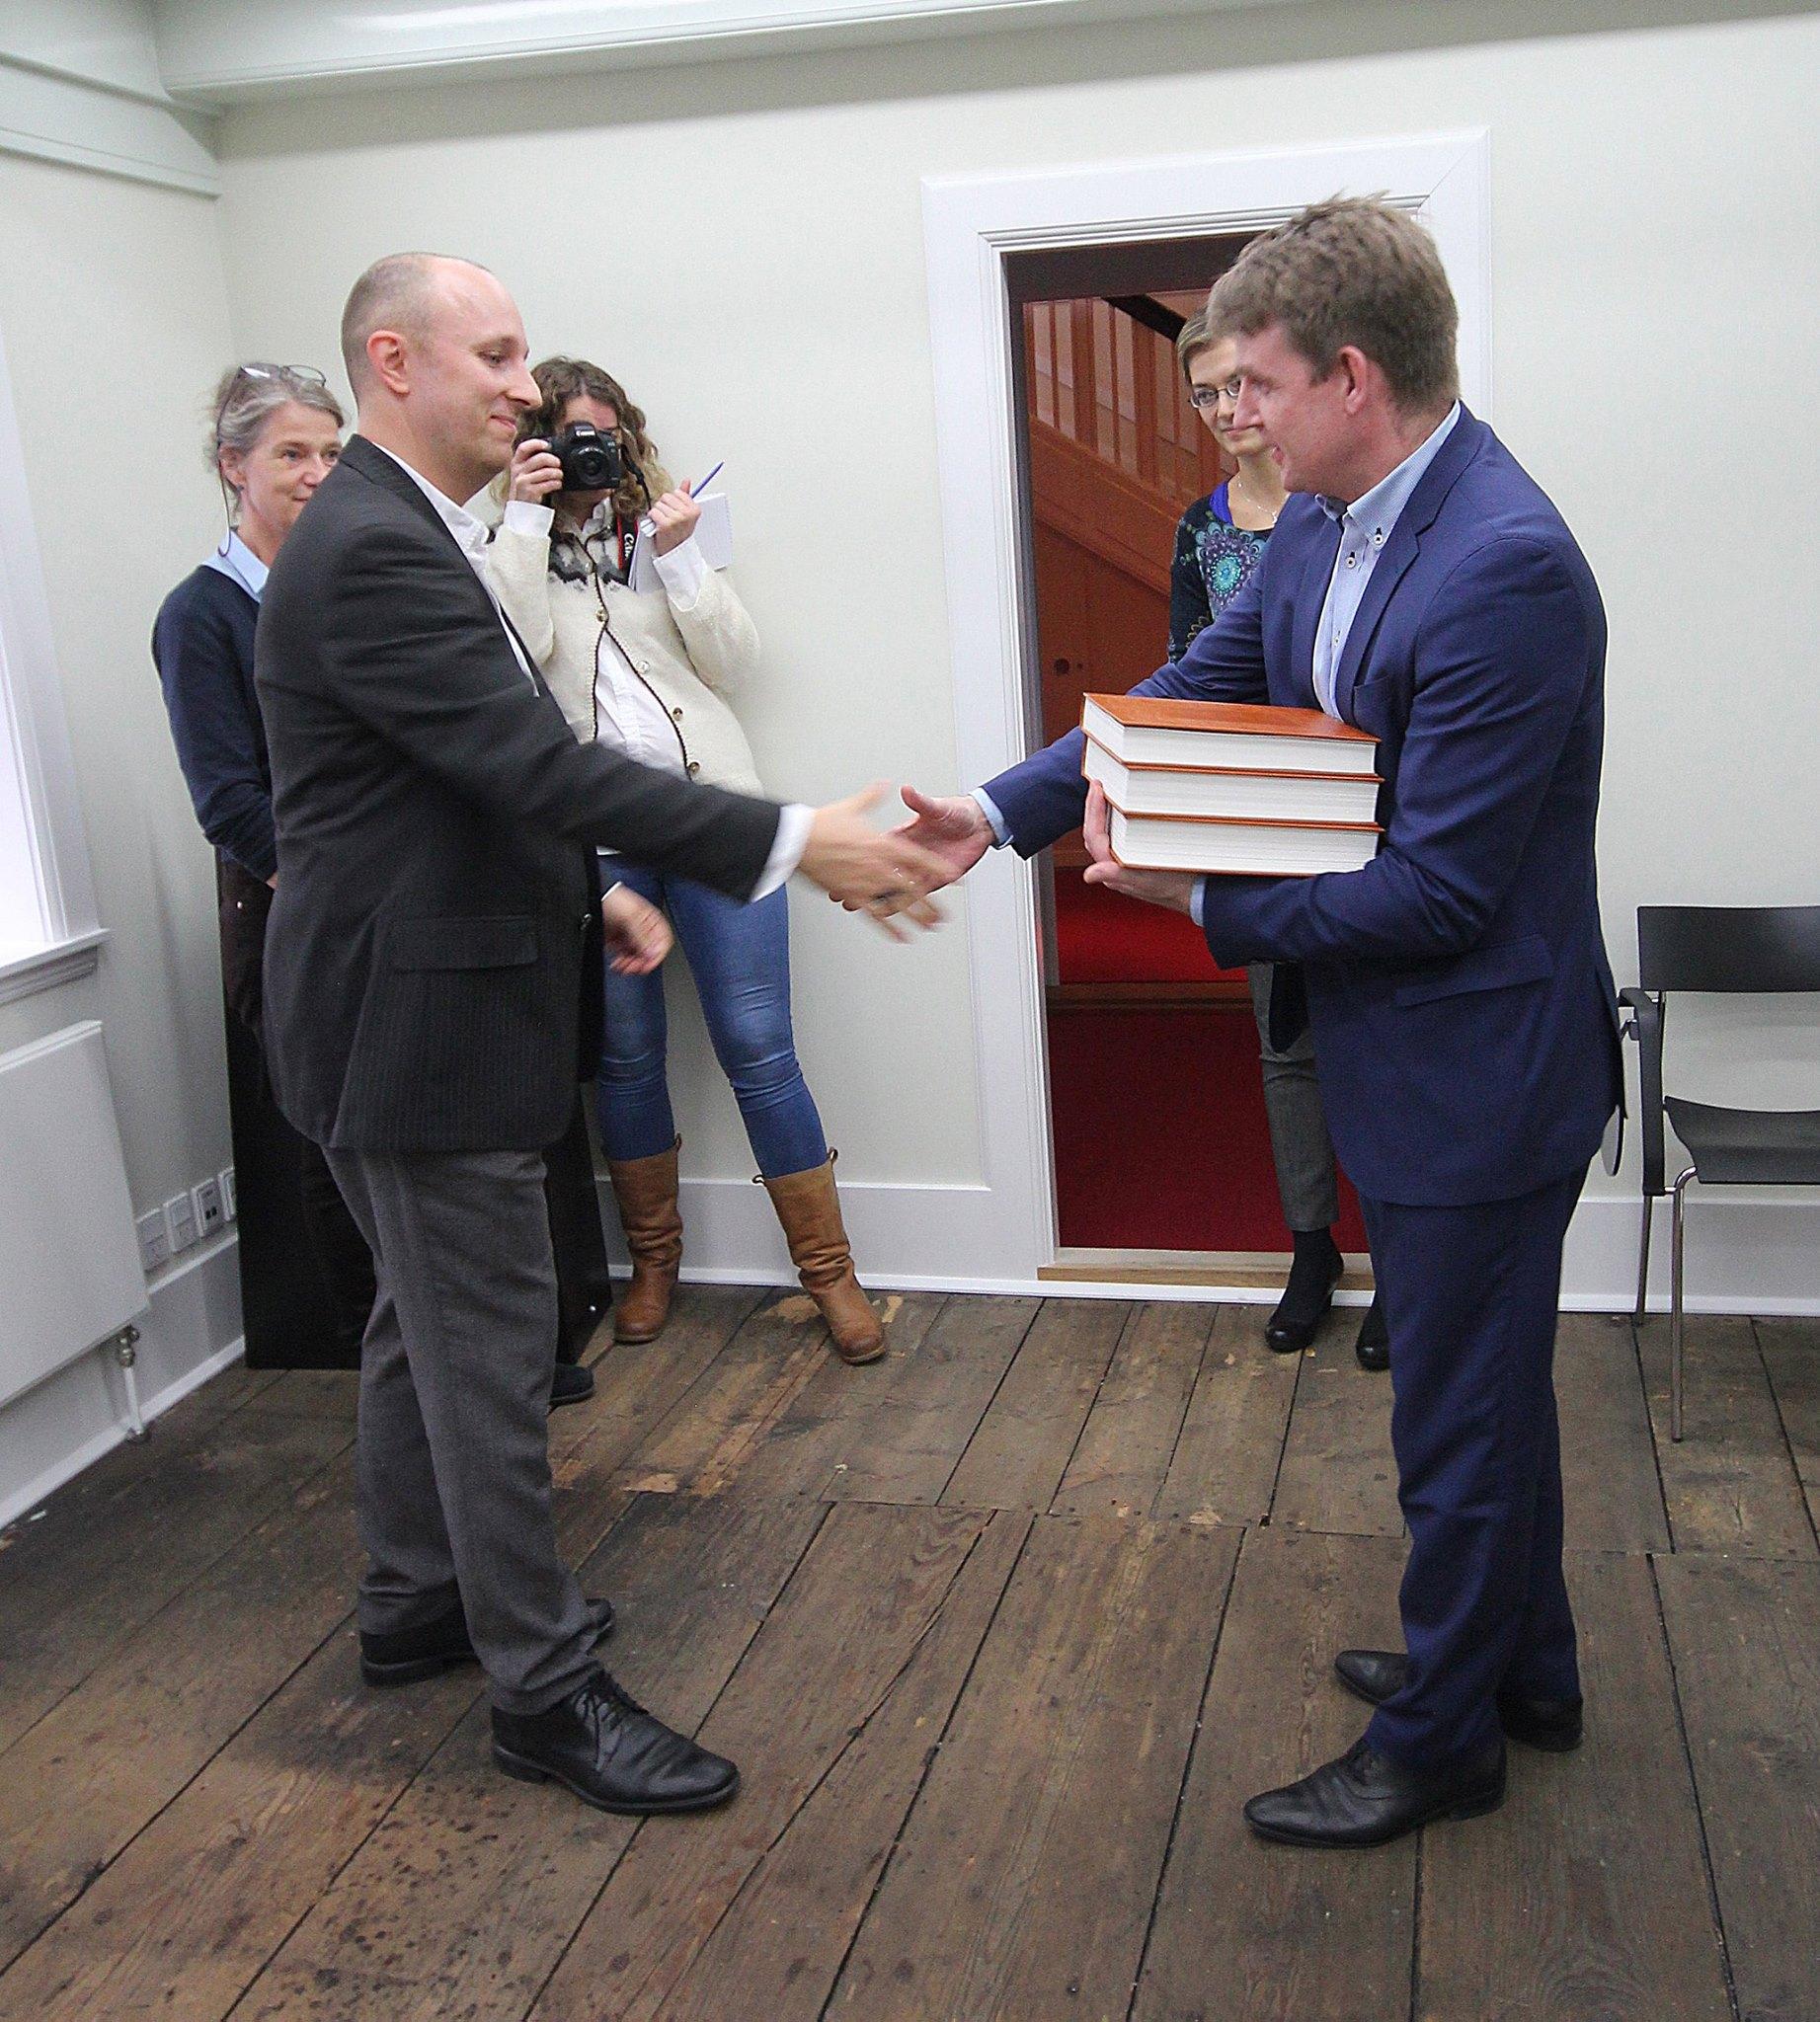 Project manager Baard Titlestad hands over Flateyjarbok vol 1-3 to the prime minister of the Faeroe Islands, Axel V. Johannesen, in Torshavn.